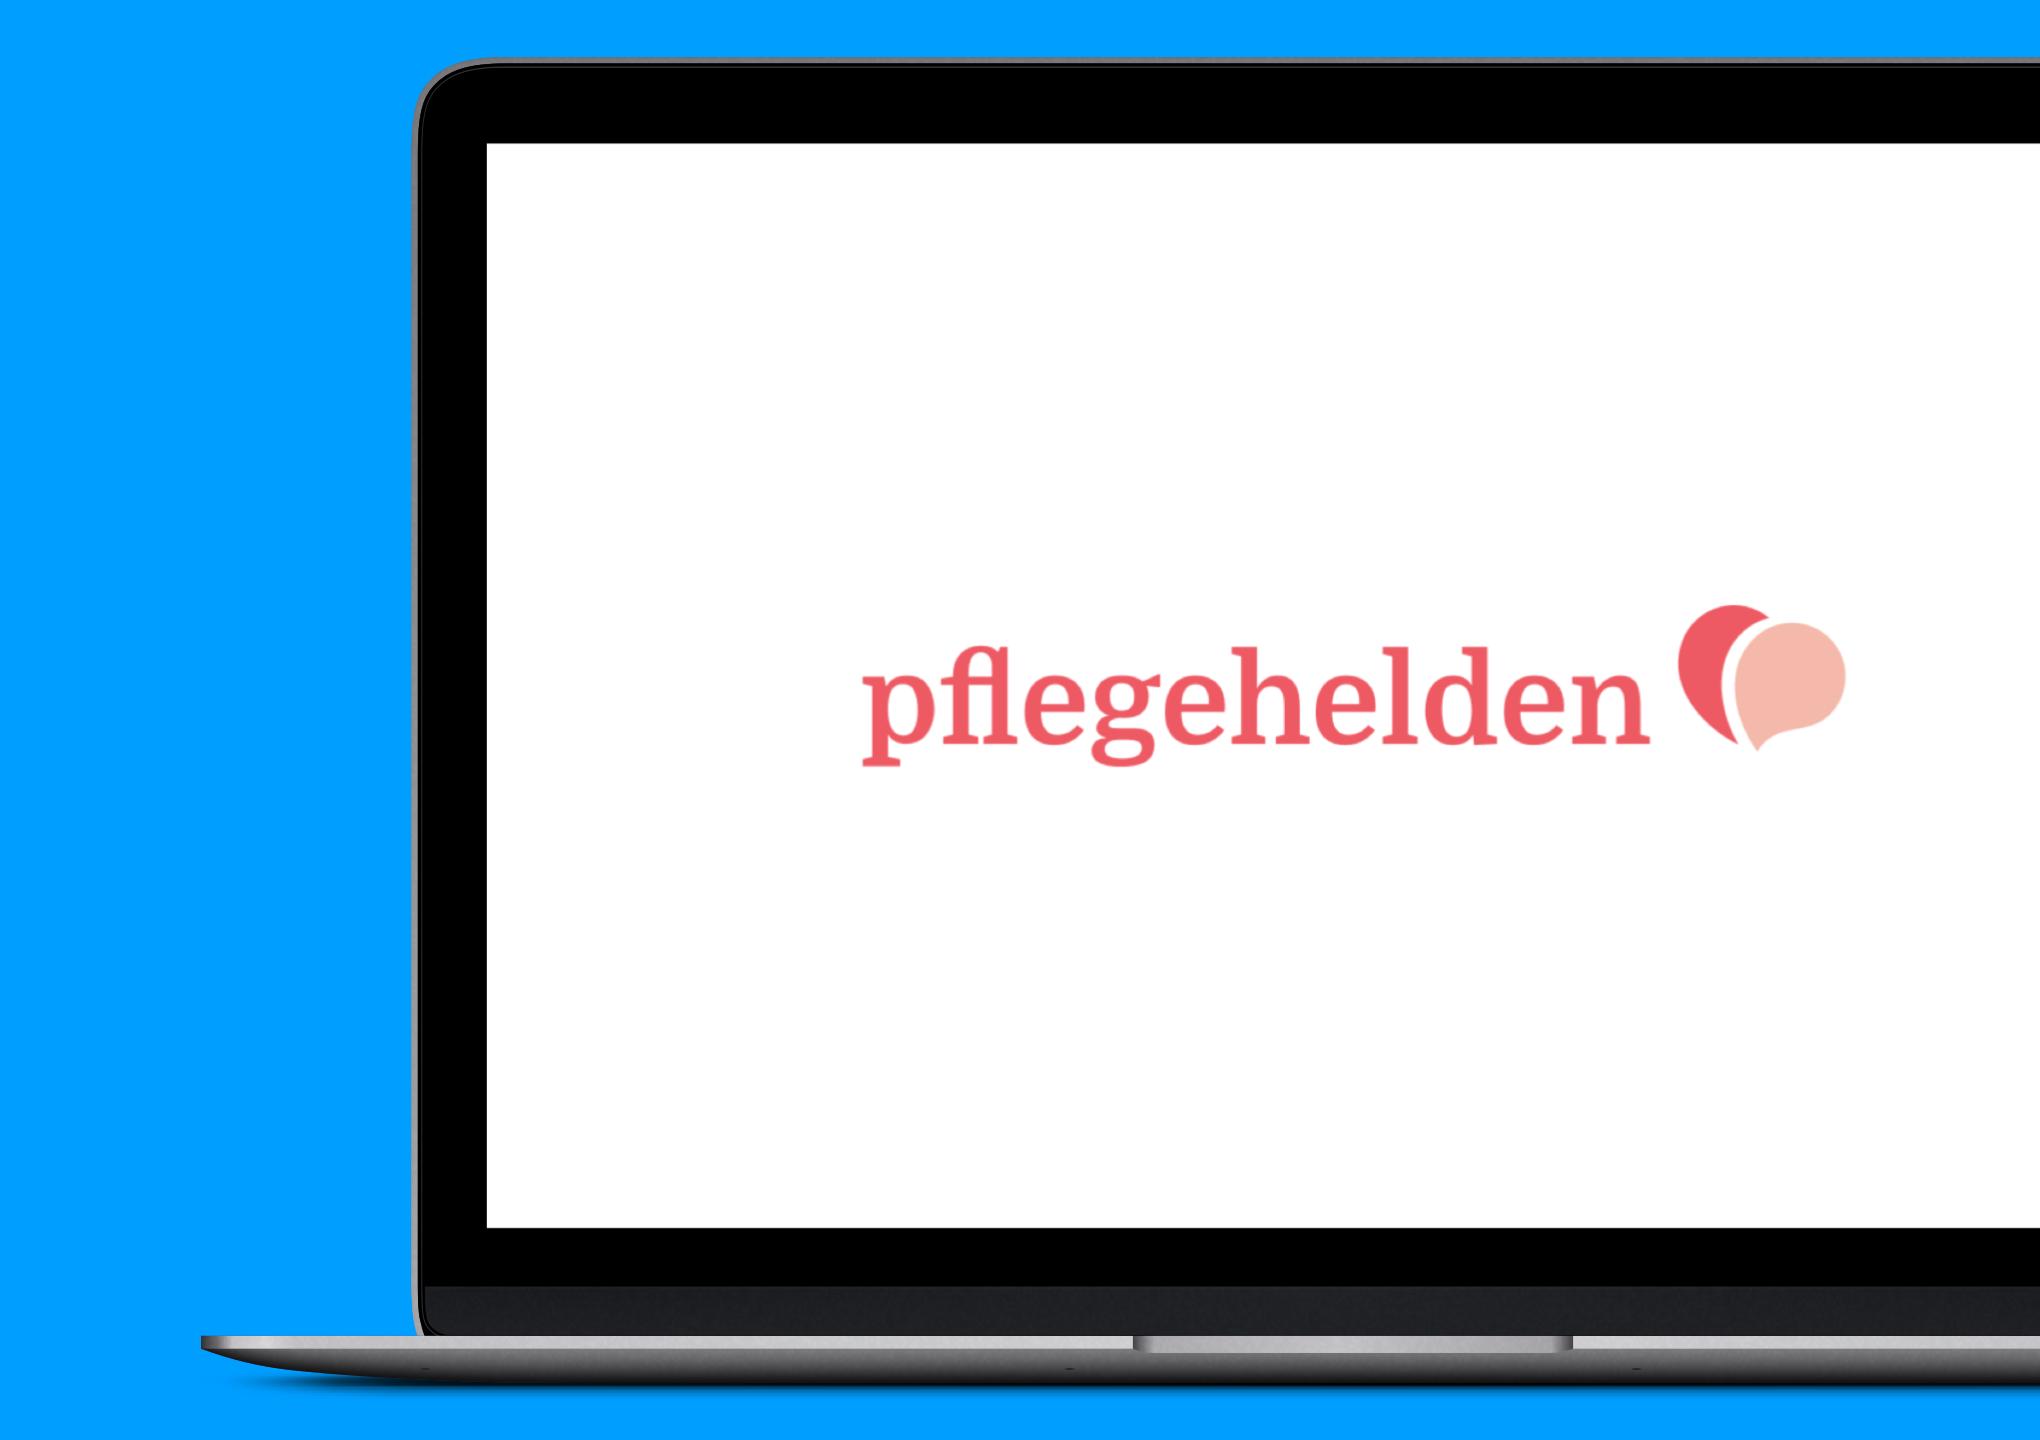 pflegehelden Logo Teaser.png